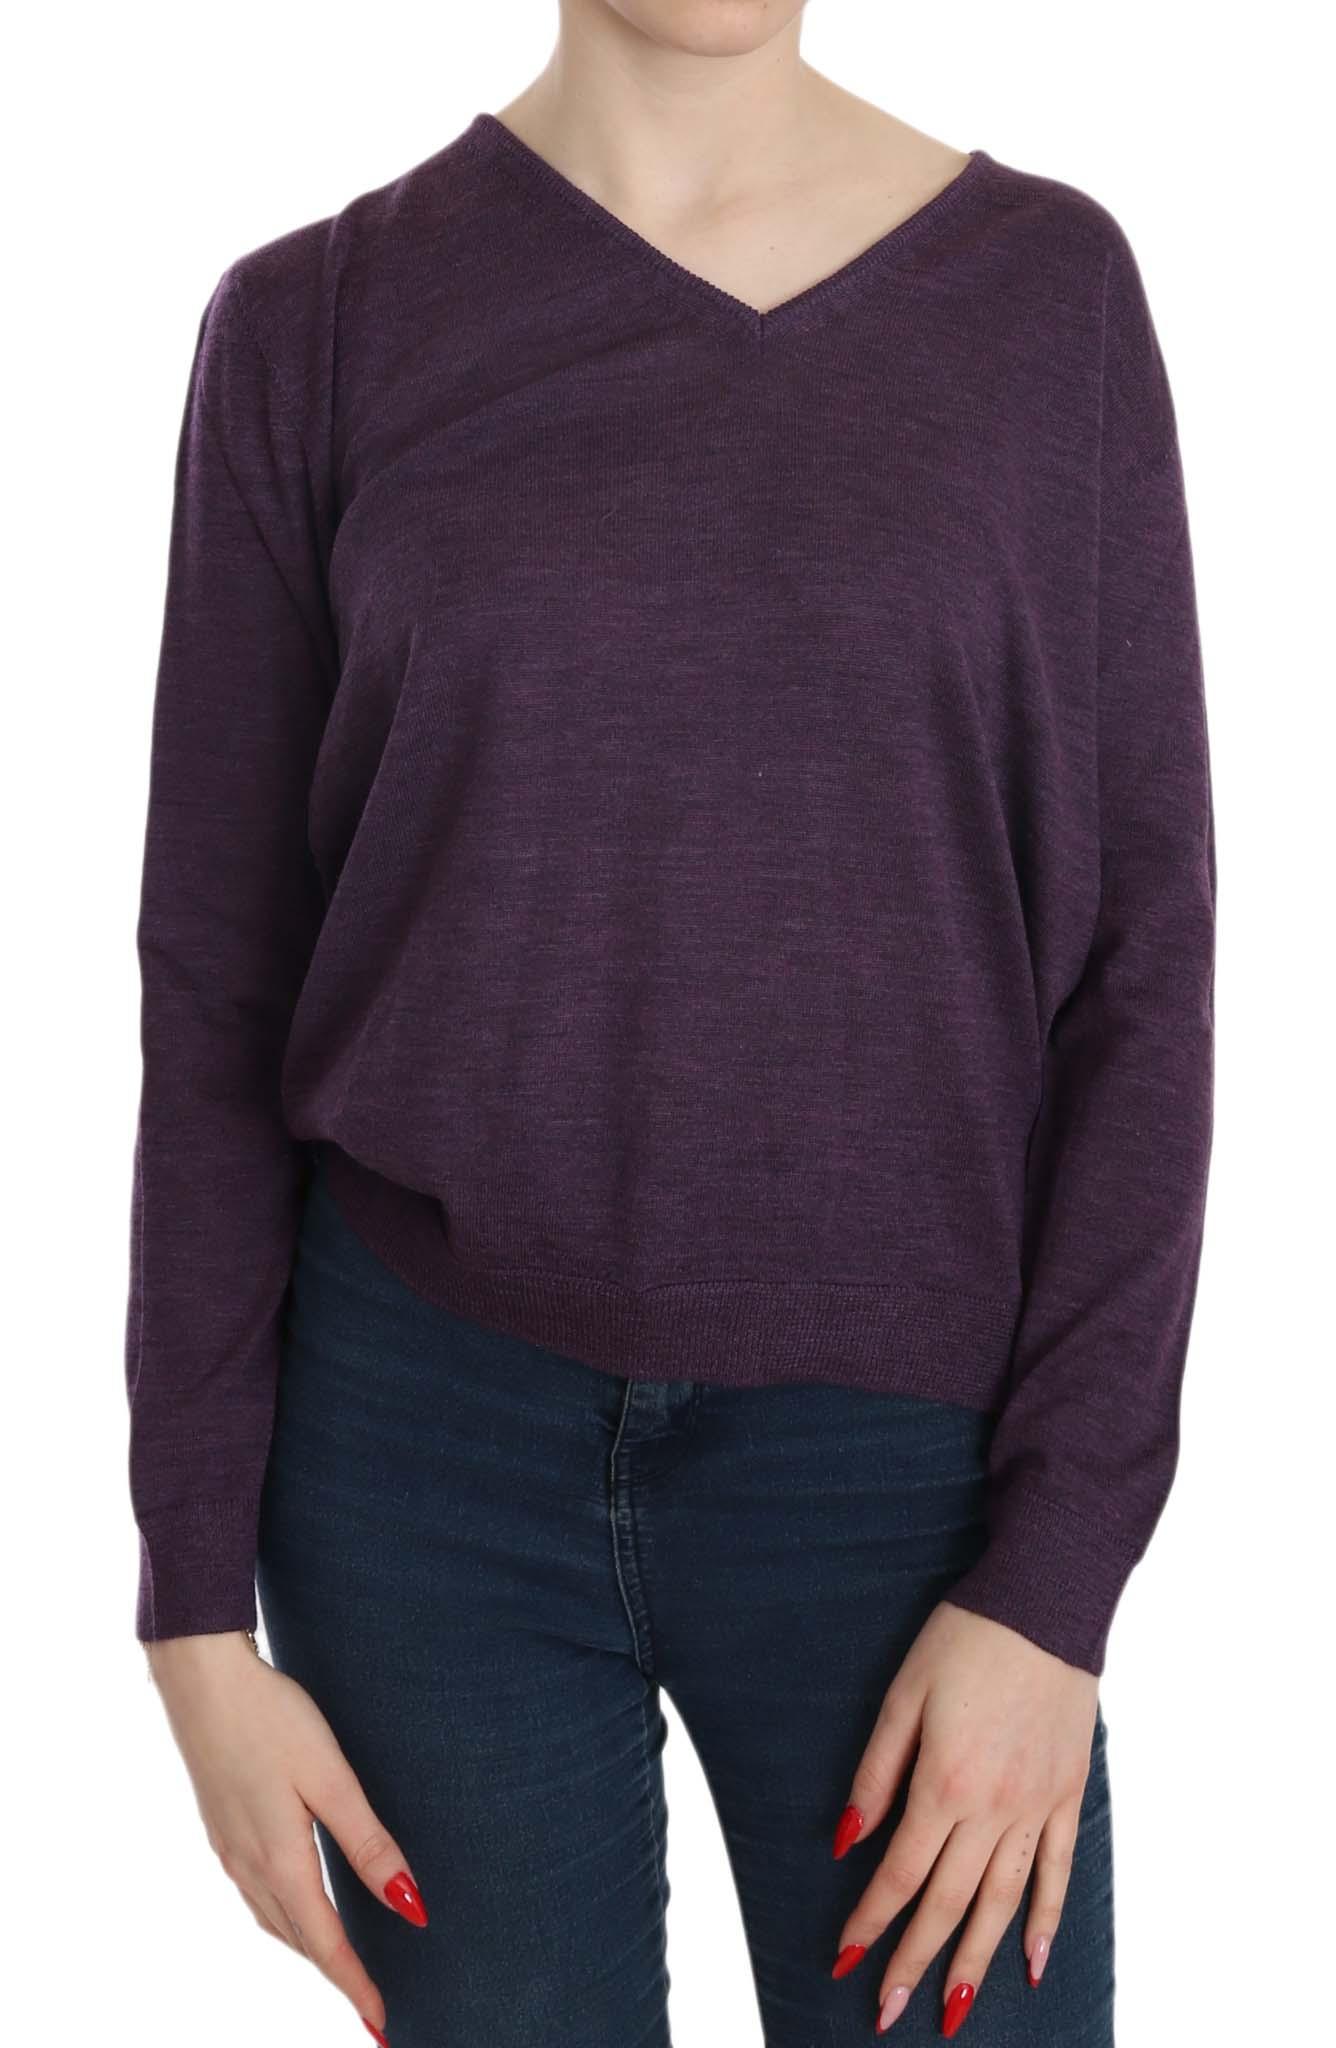 BYBLOS Women's V-neck LS Pullover Purple TSH3898 - S